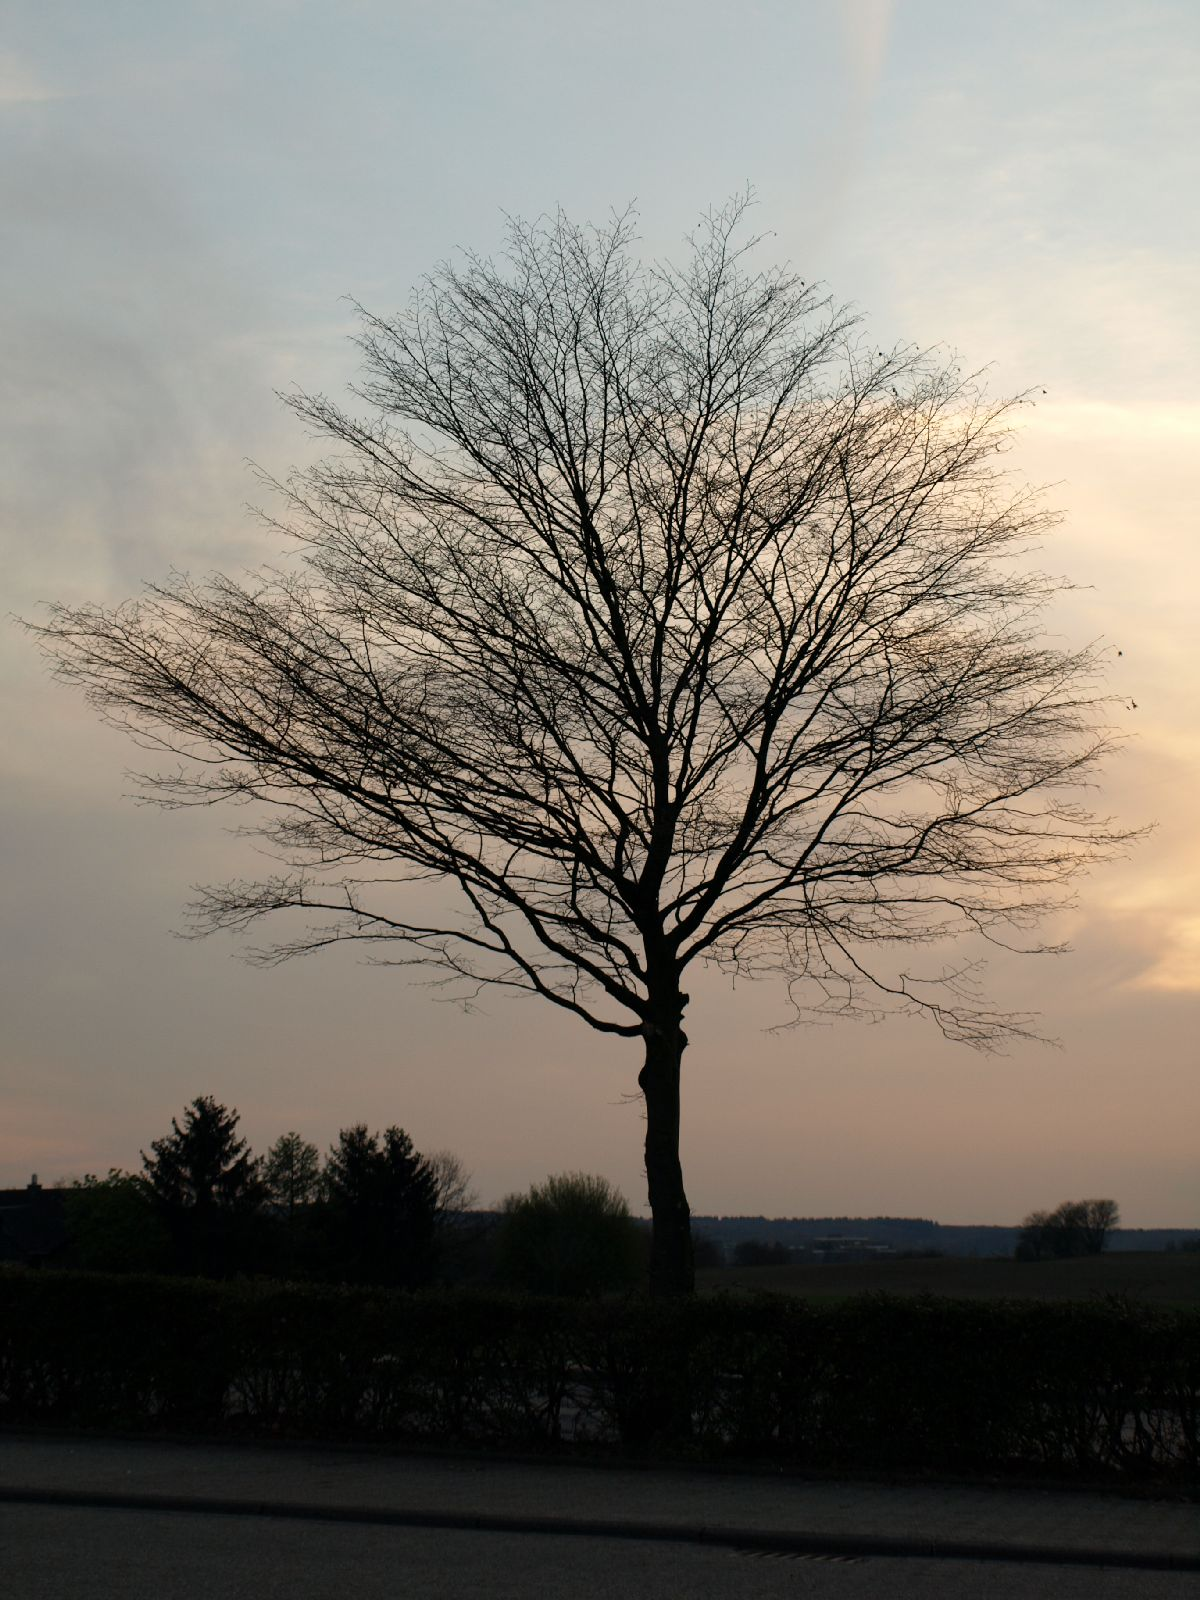 Plants-Trees_Photo_Texture_B_P4171367